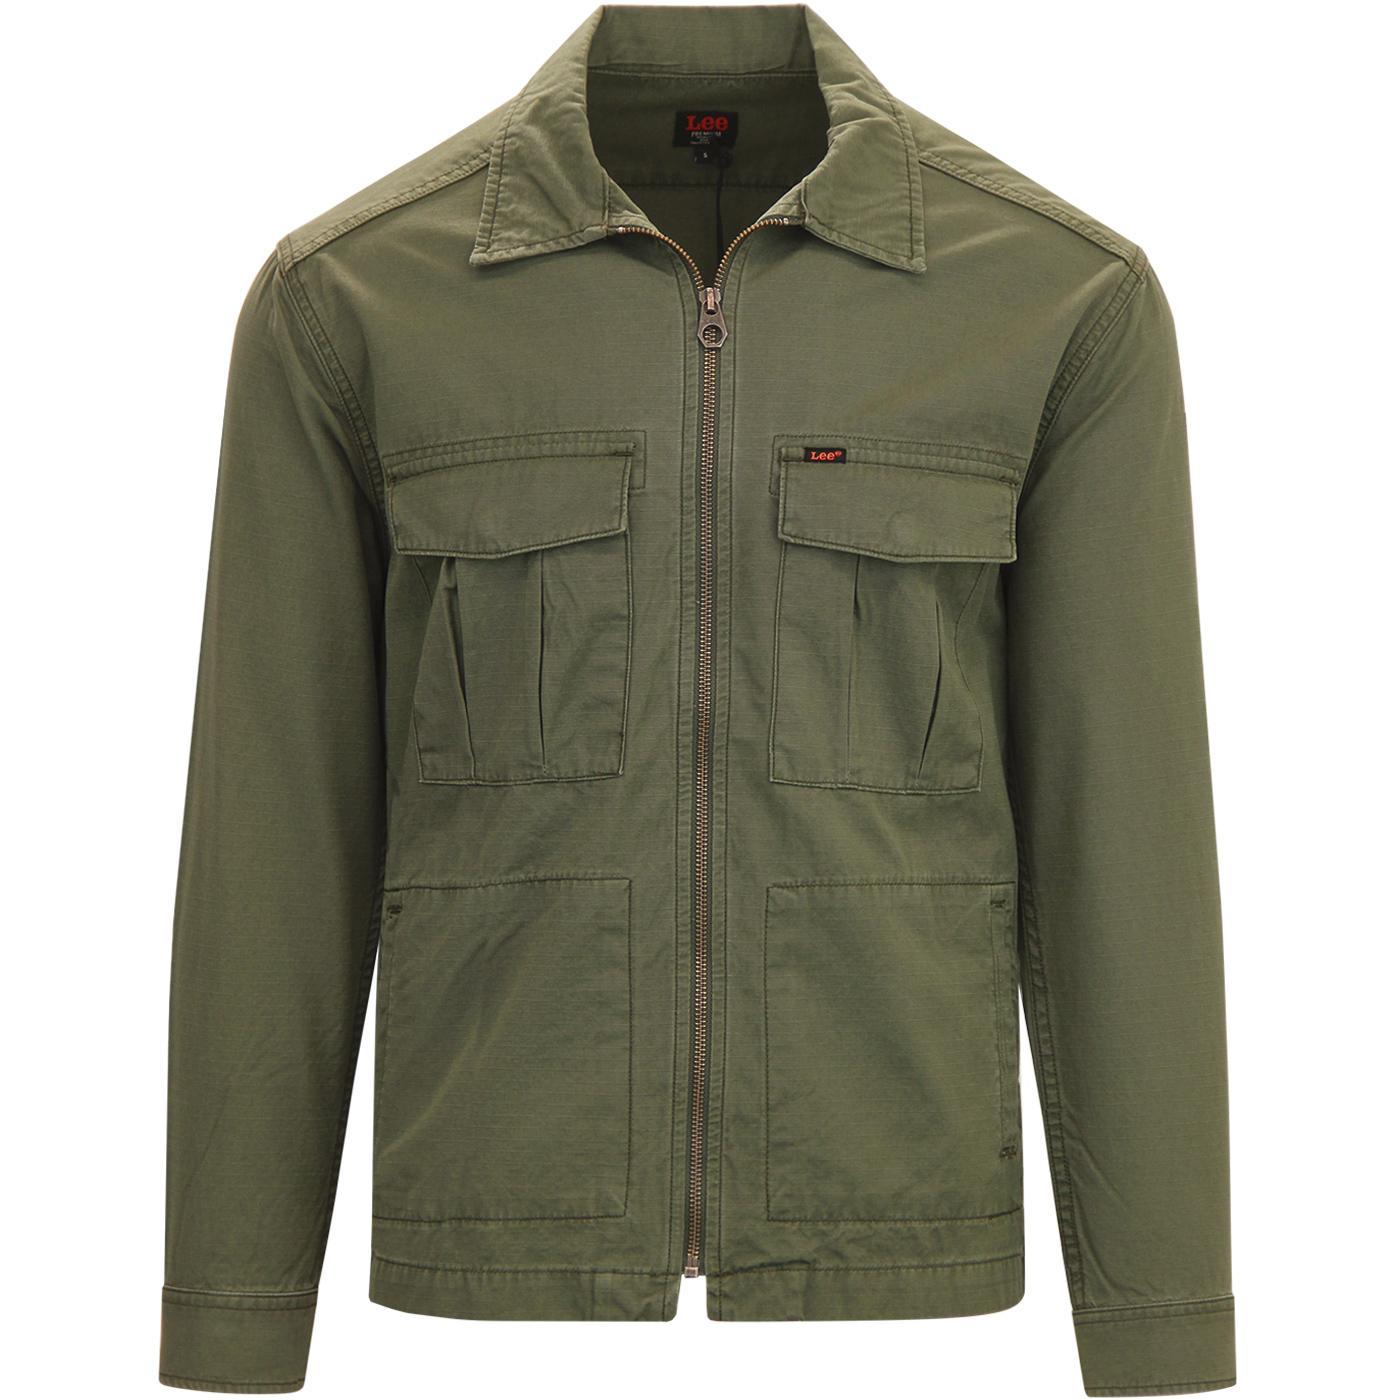 LEE JEANS Retro Military Fatigue Overshirt Jacket